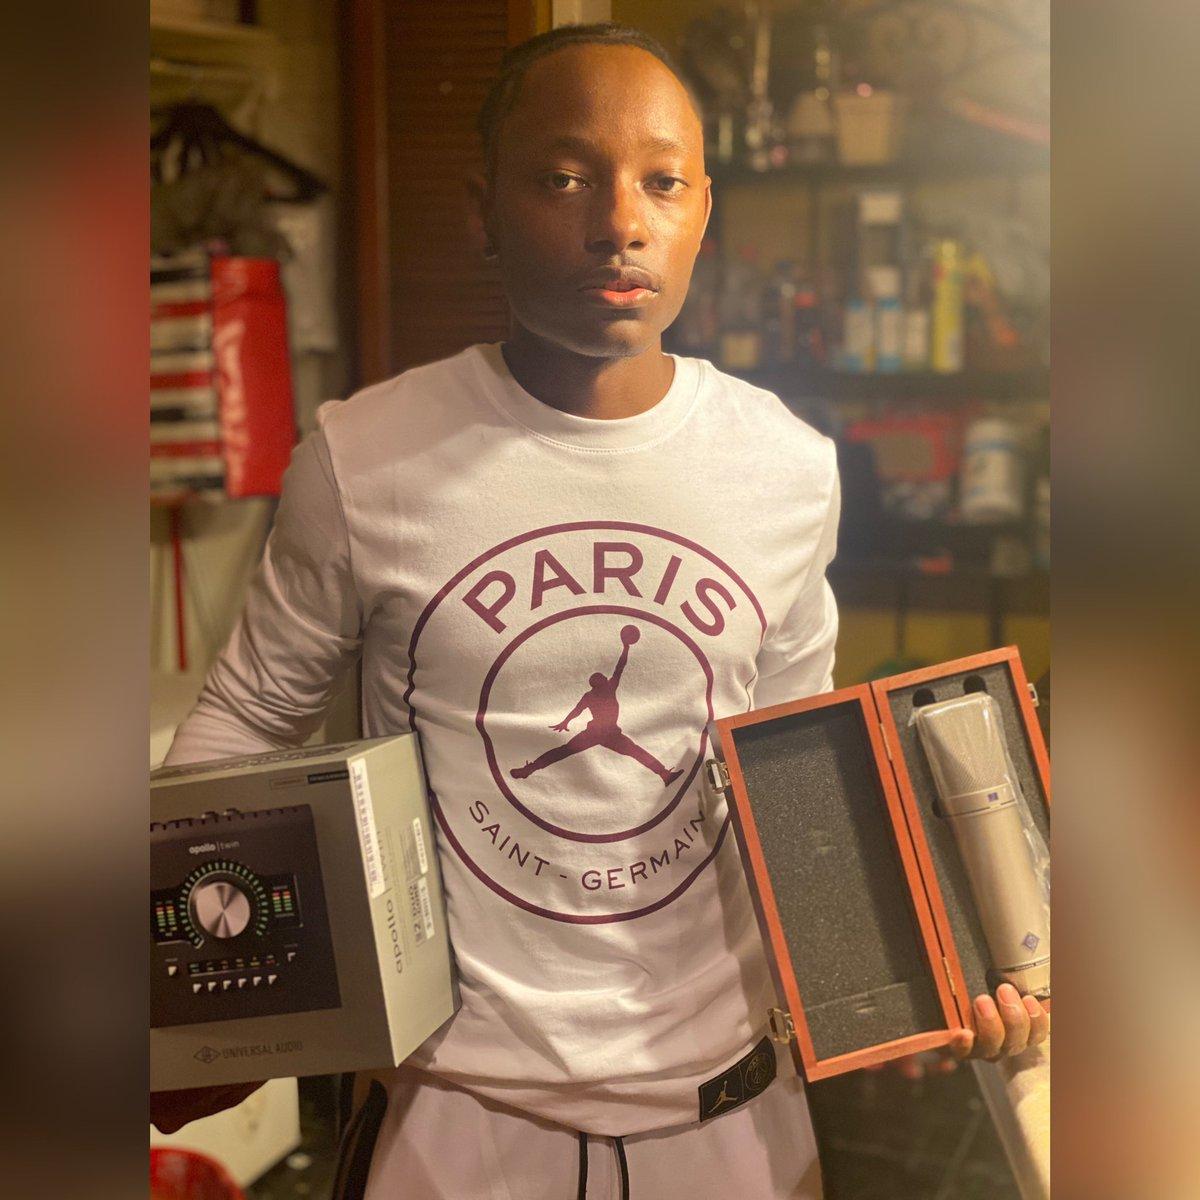 👇(PARIS Studios) https://t.co/mTRrow7zD9  Invest in Your Craft.  #music #producer #engineer #rapper #singer #rap #sing #Beats #studio #RecordingStudio #LogicPro #Ableton #ProTools #MusicStudio #ExplorePage #BurbankStudio #ParisStudios #Paris #ApollTwin #NeumannU87 #ParisP https://t.co/lTCW6orcKq